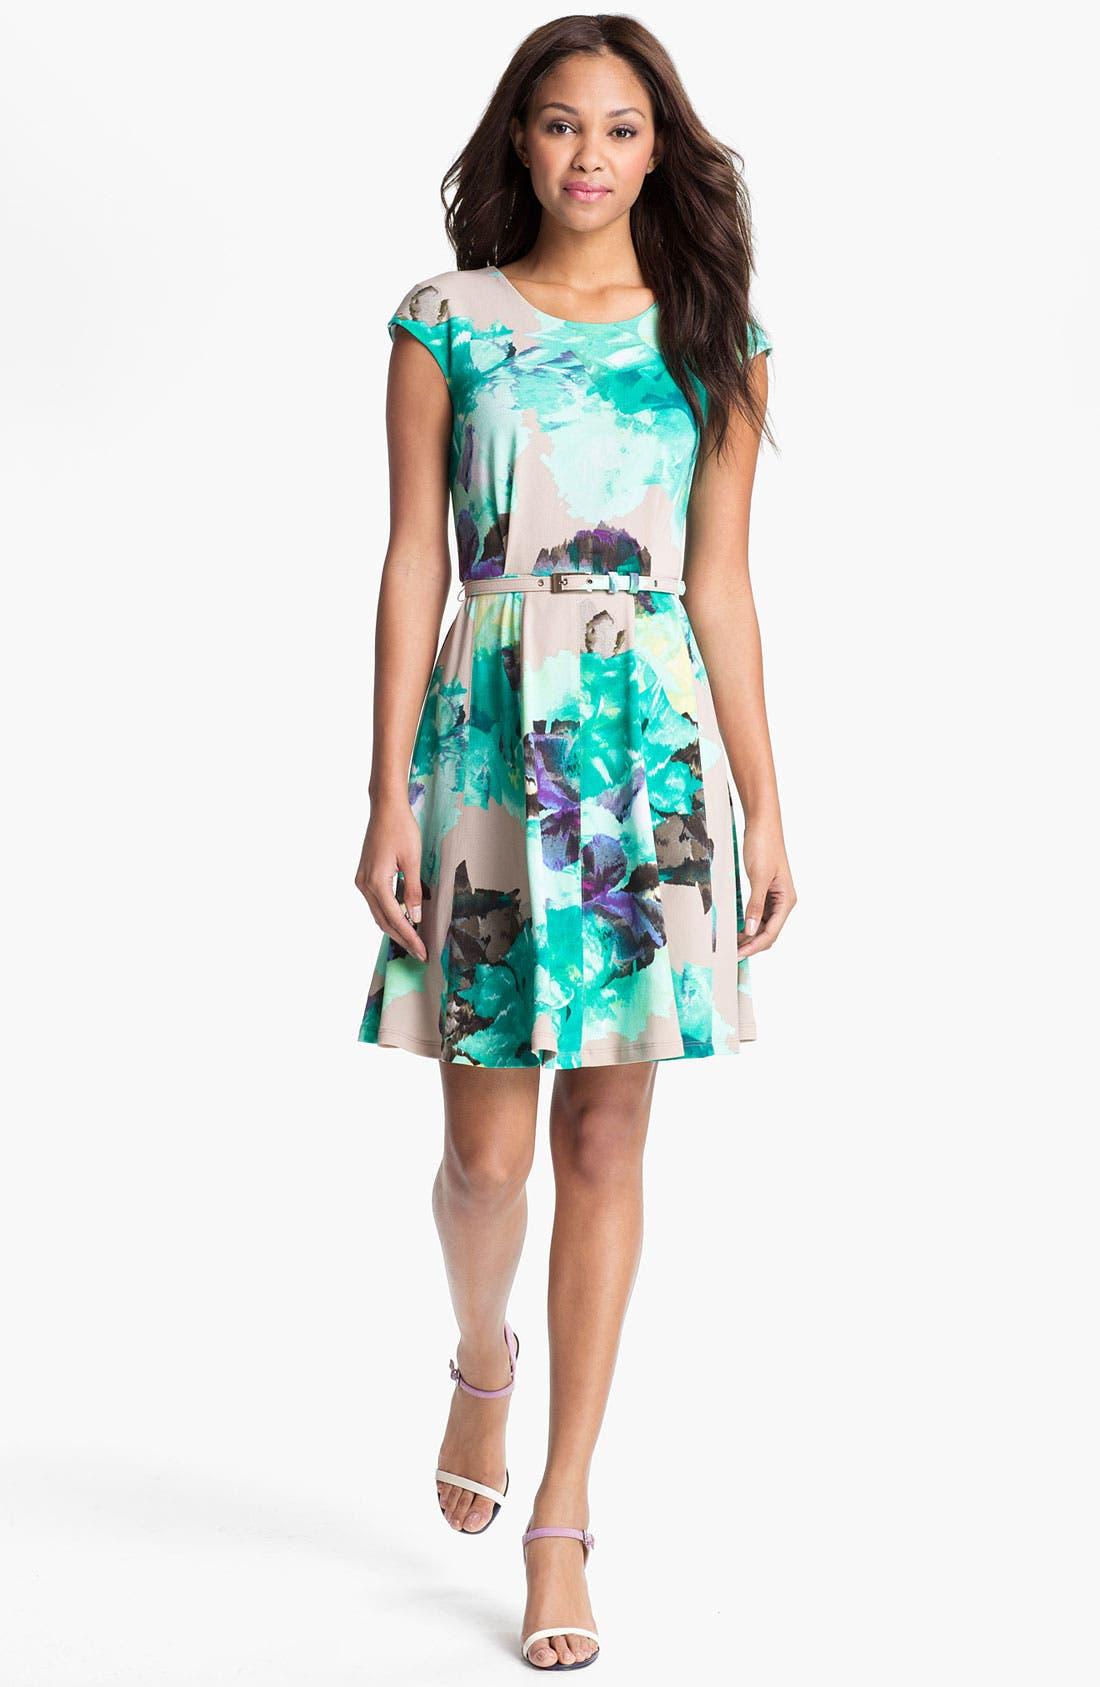 Main Image - Alex & Ava Print Fit & Flare Dress